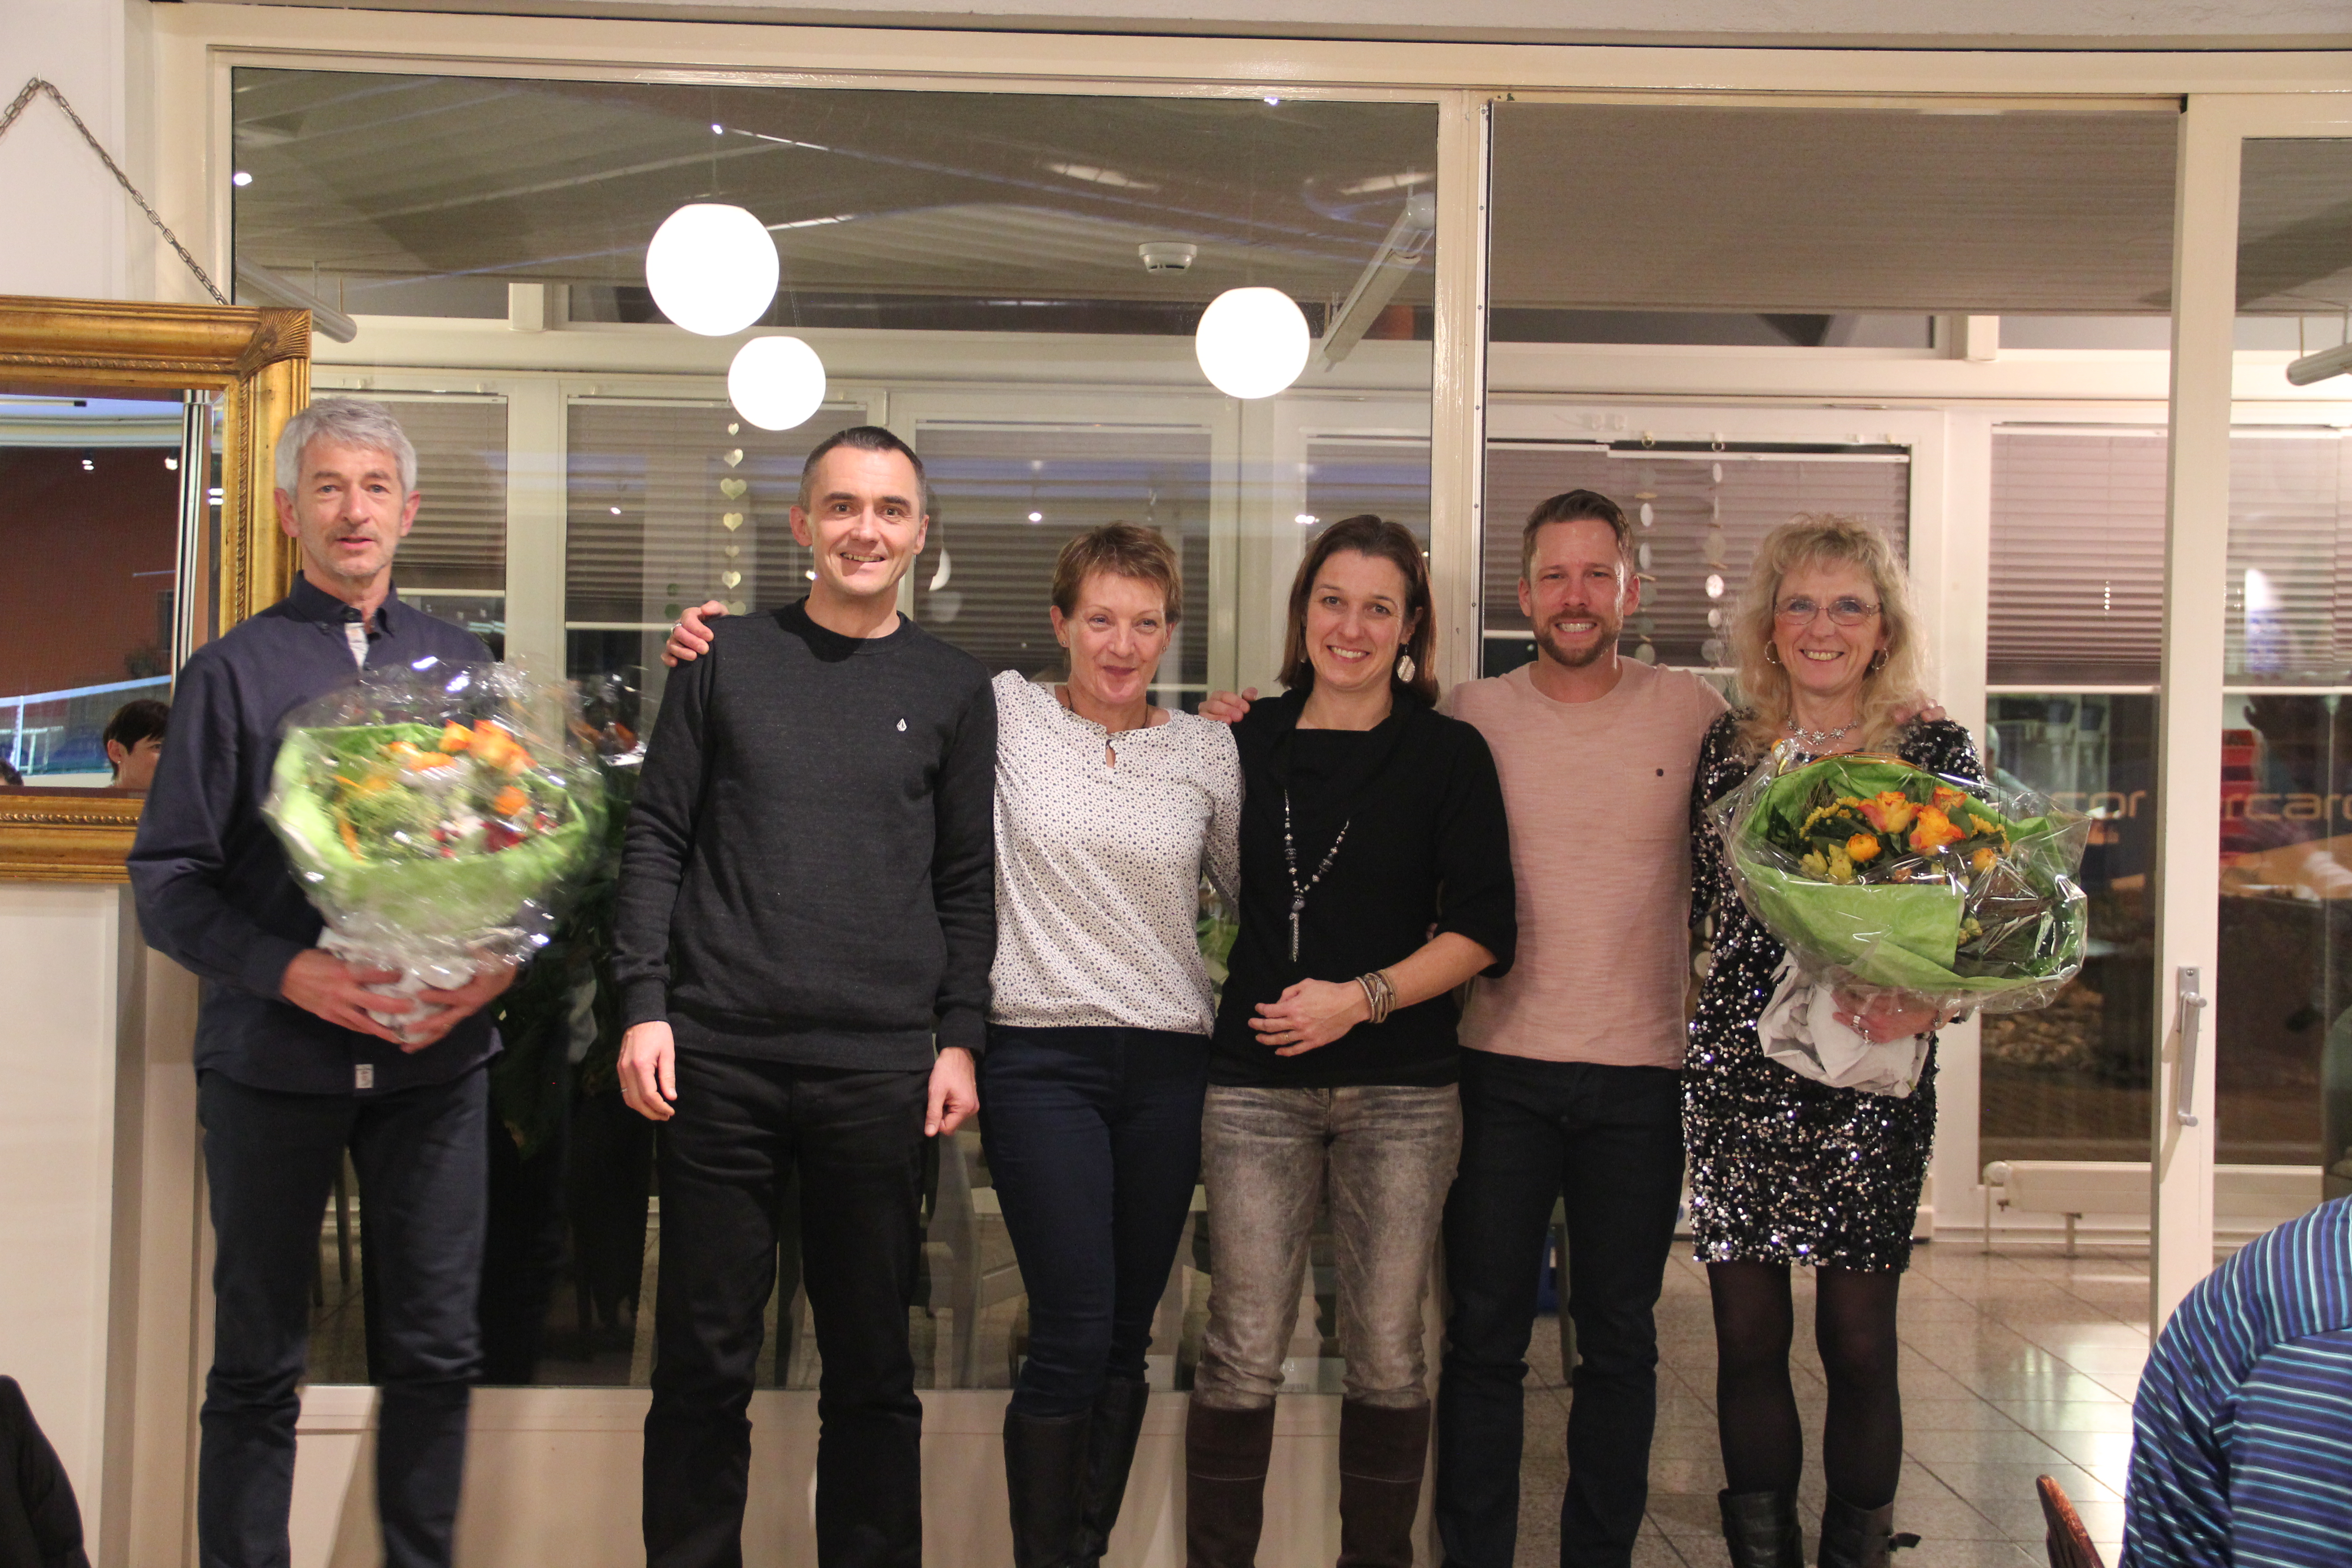 Die ersten Ränge der Vereinsmeisterschaft (v.l.n.r.): Walter Howald (1.), Frank Moritz (3.), Bernadette Flück (2.), Nicole Denzler (3.), Daniel Lorenz (2.) Vreny Gerber (1.)